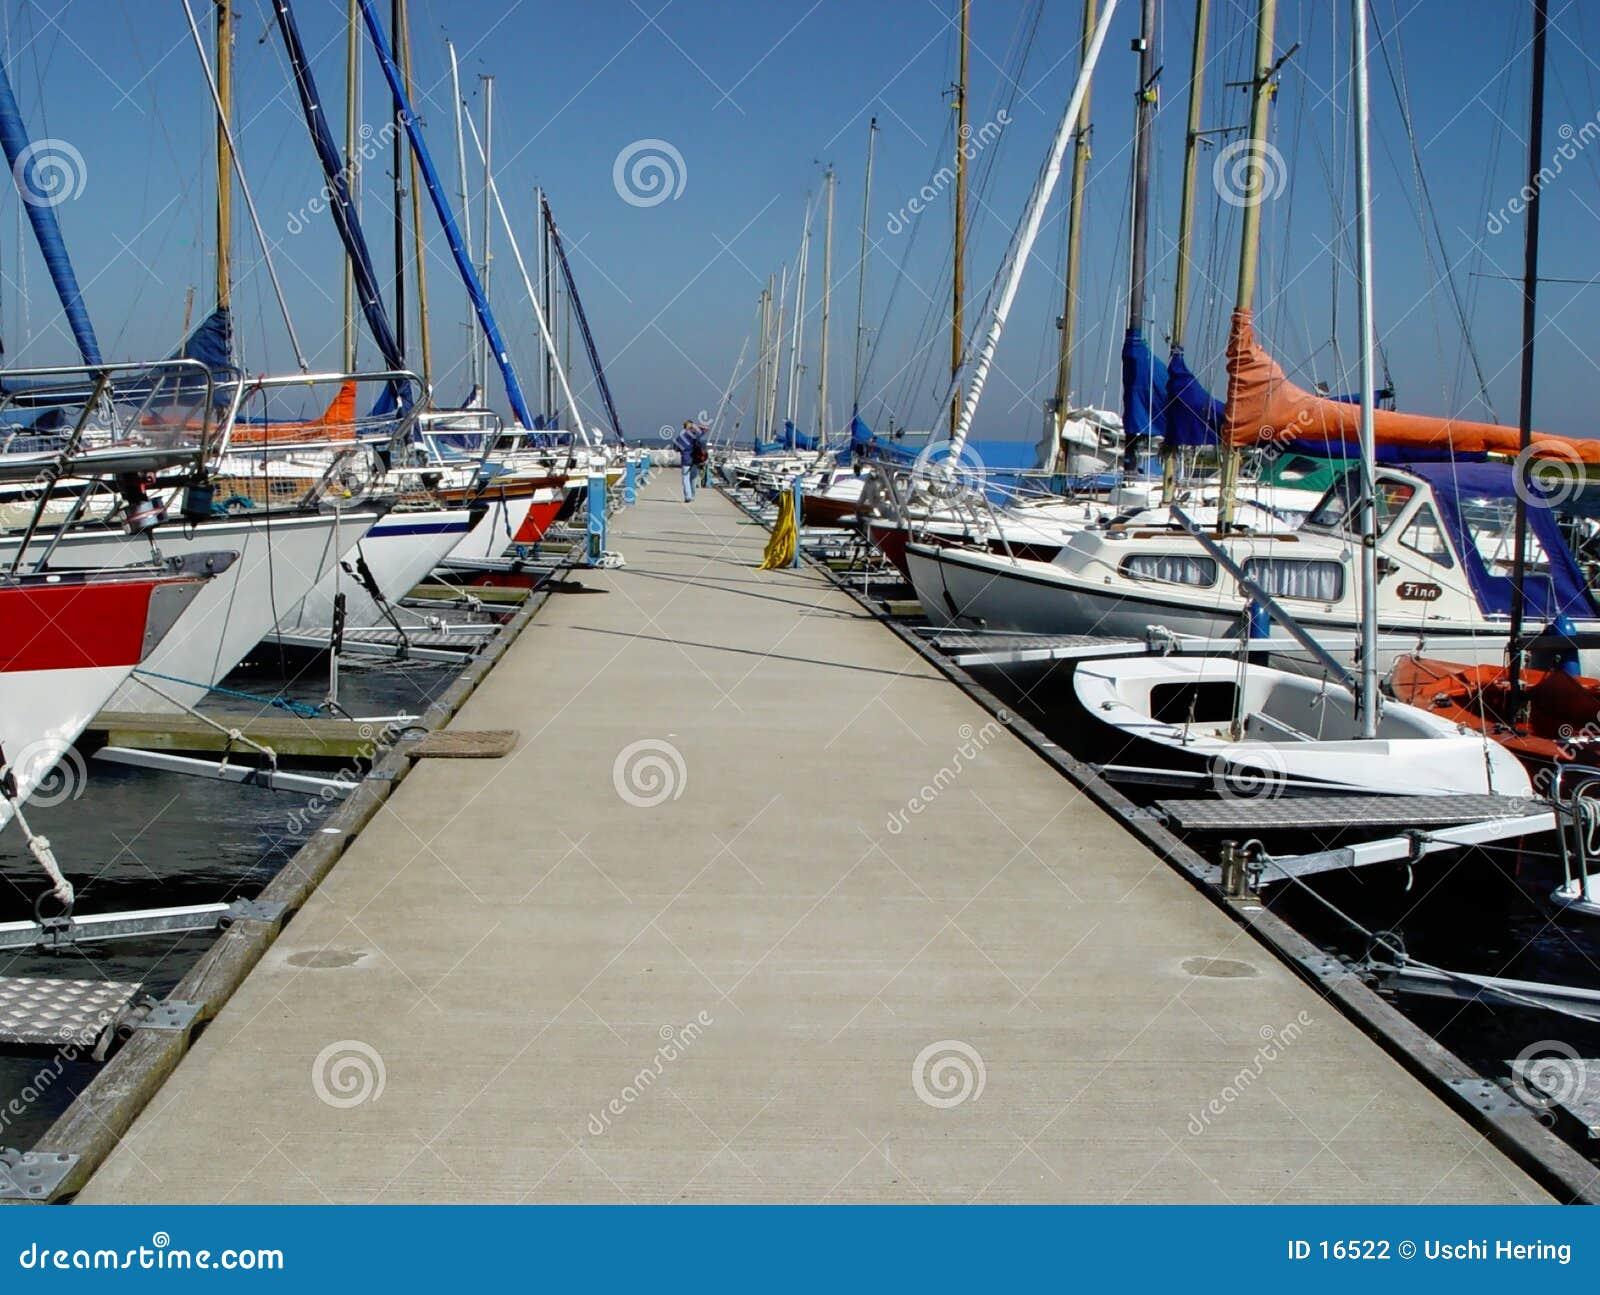 Pilastro in un randello yachting